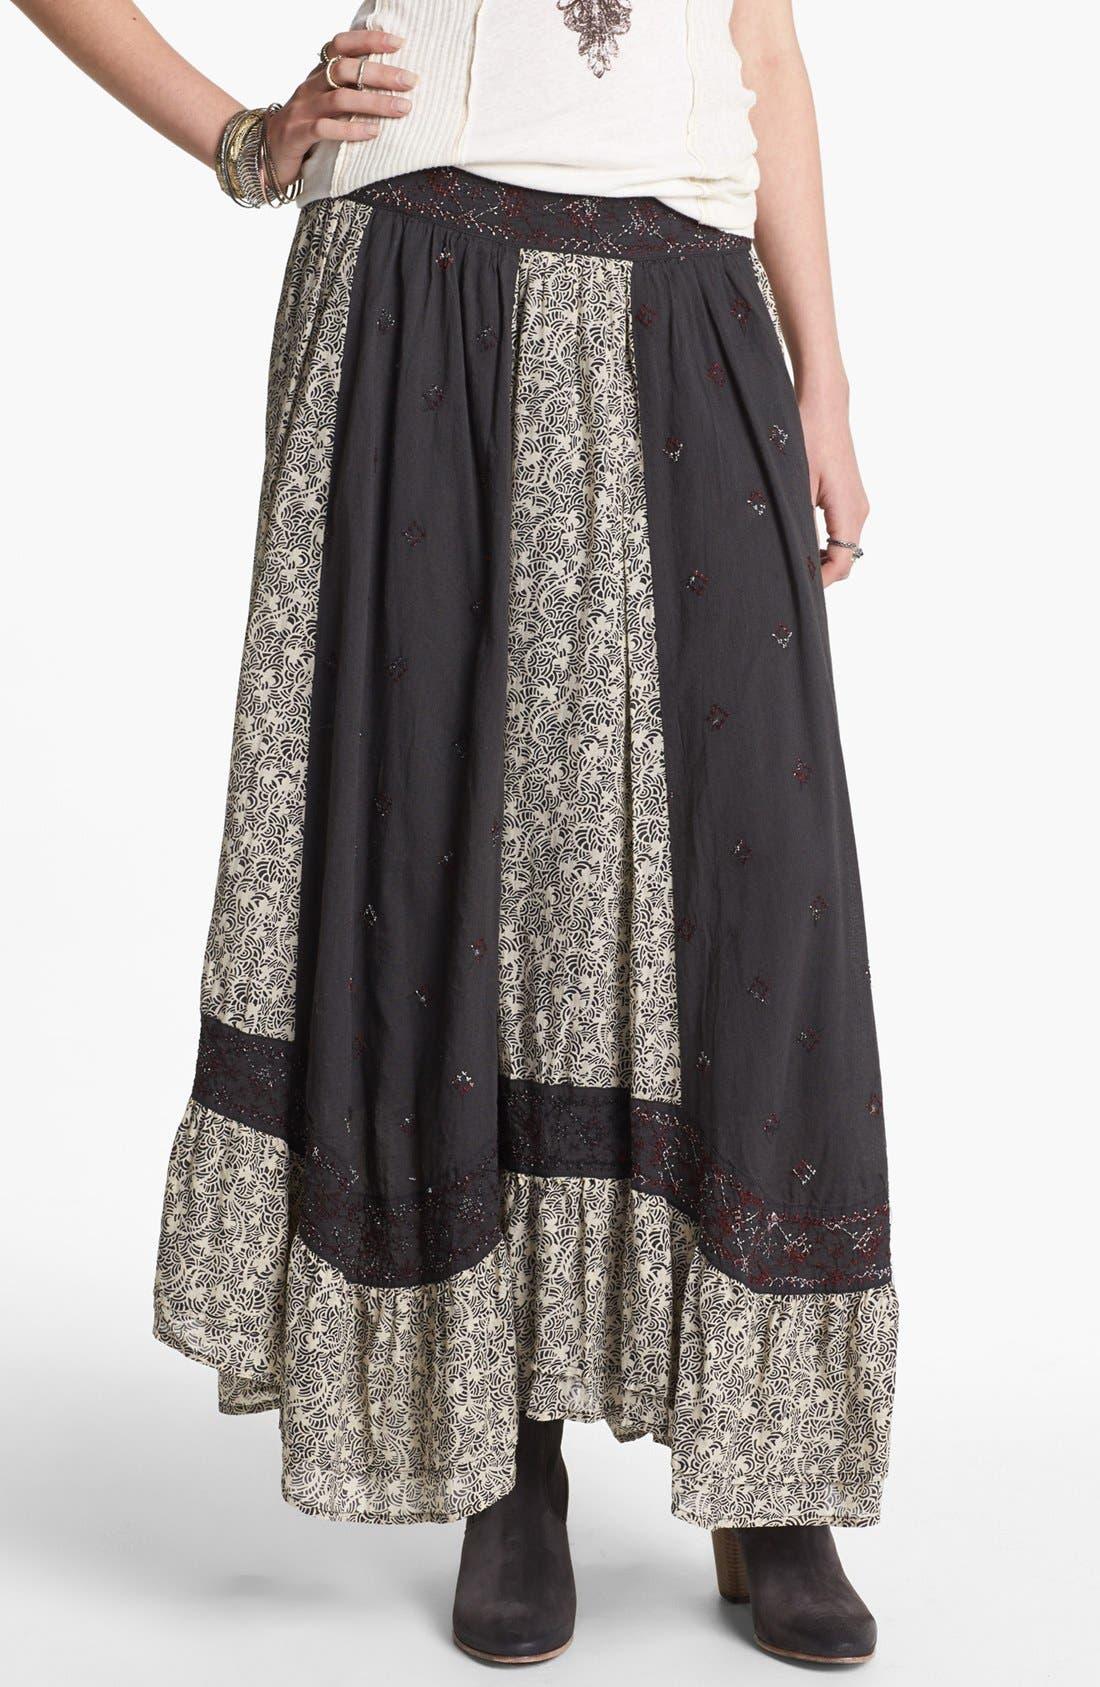 Alternate Image 1 Selected - Free People 'Heirloom' Embroidered Peasant Skirt